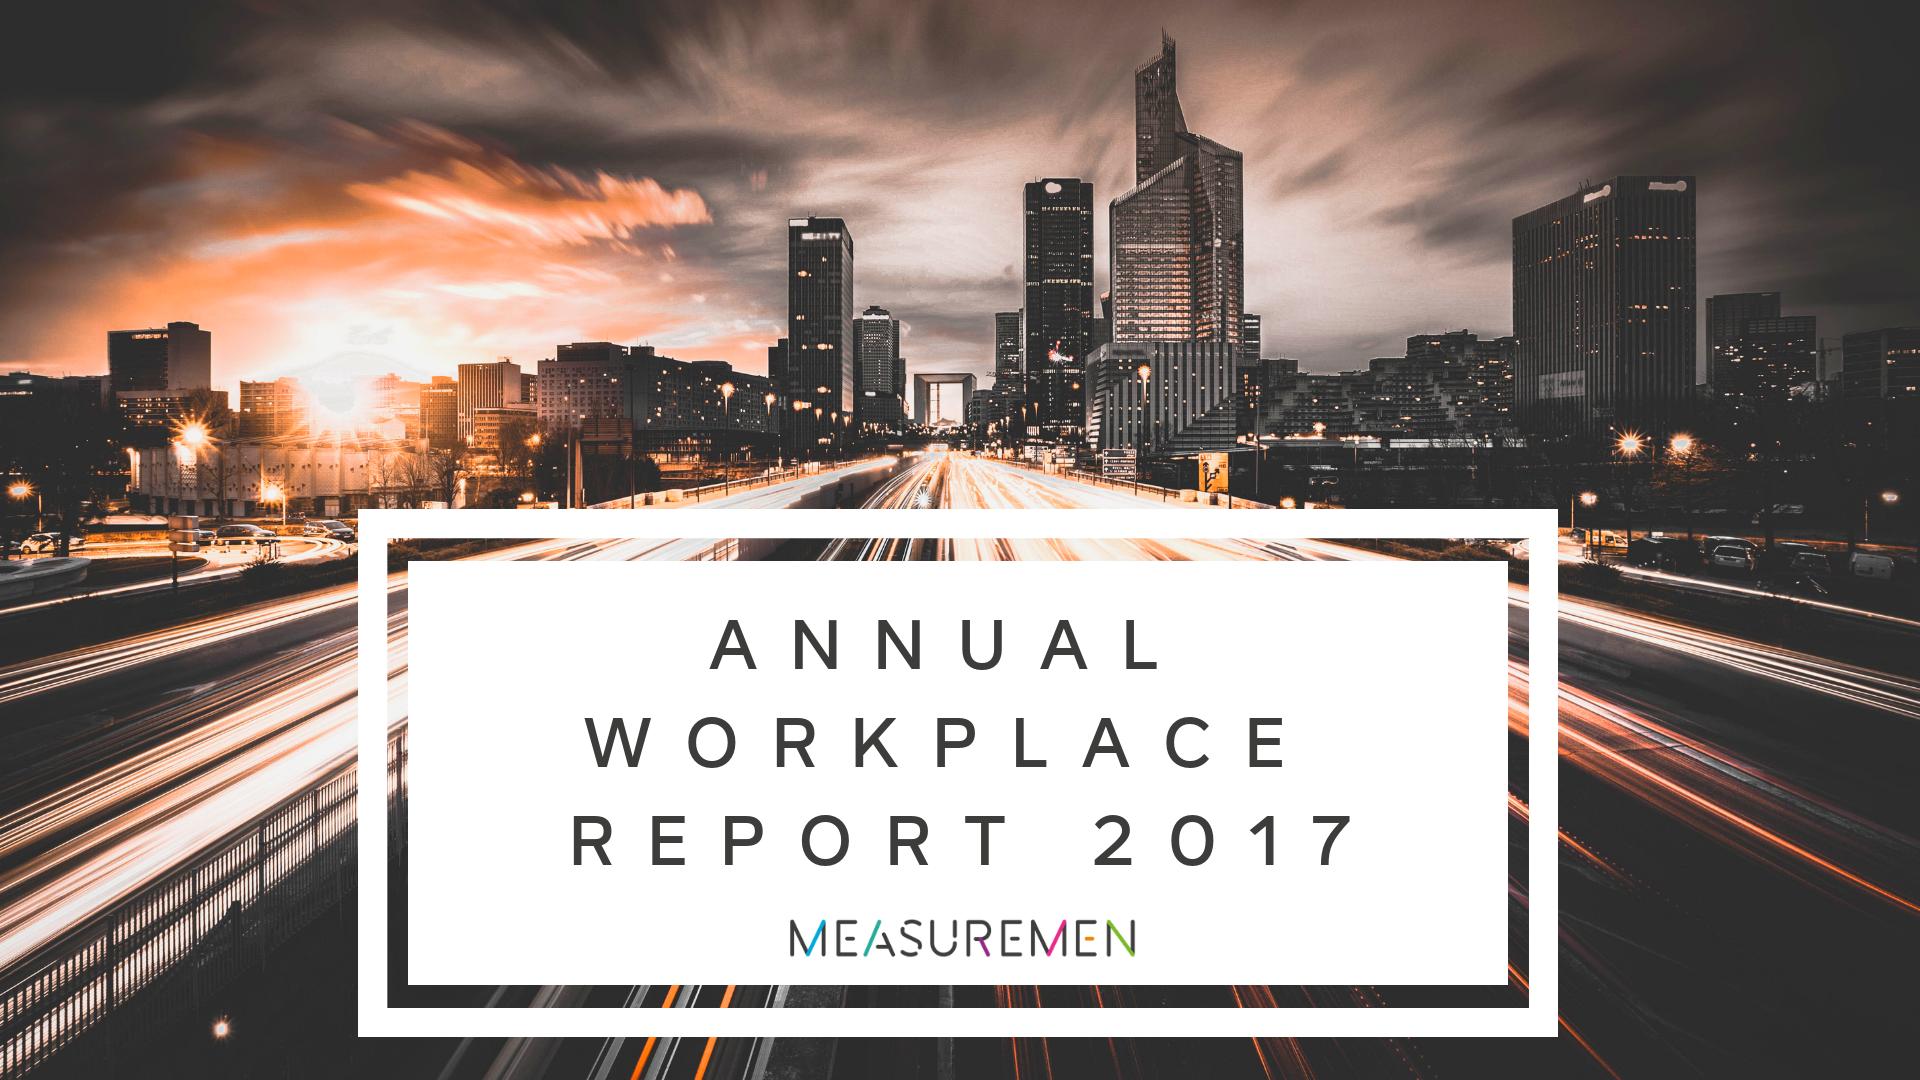 Measuremen Annual Workplace Report 2017